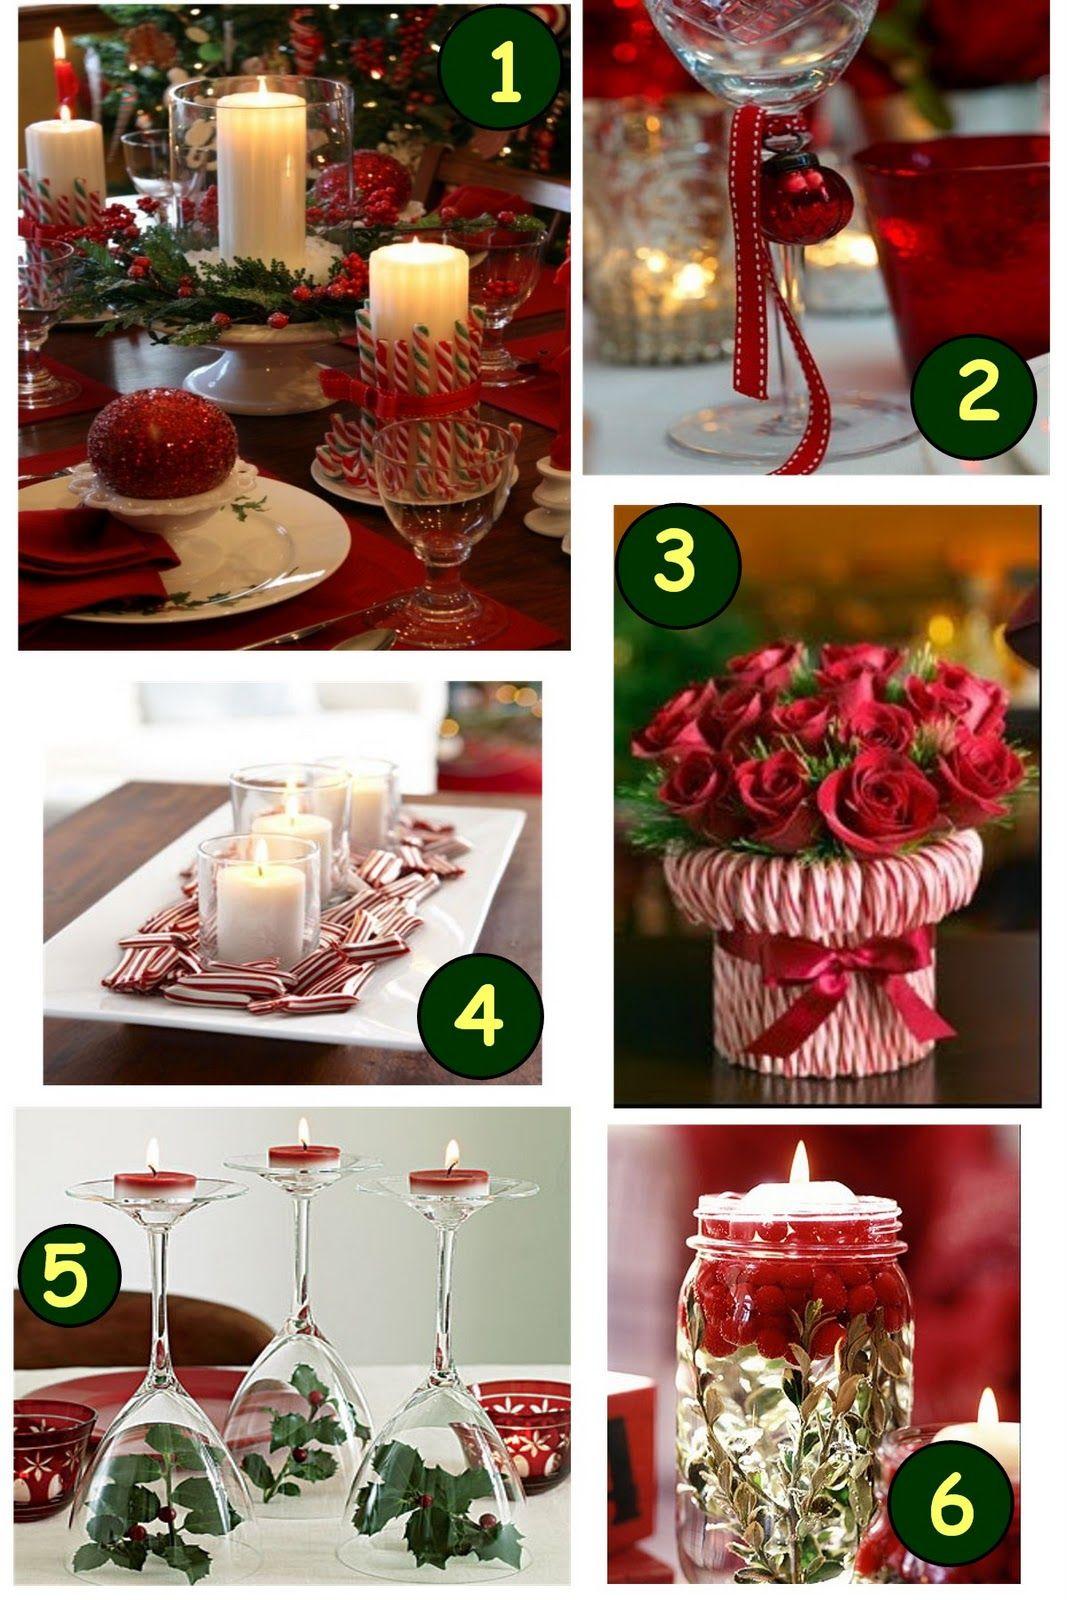 Christmas Party Table Decorations Are Some Great Christmas Decor Ideas For Your Christmas Di Decoracion Navidad Adornos Navidenos Centros De Mesa Navidad